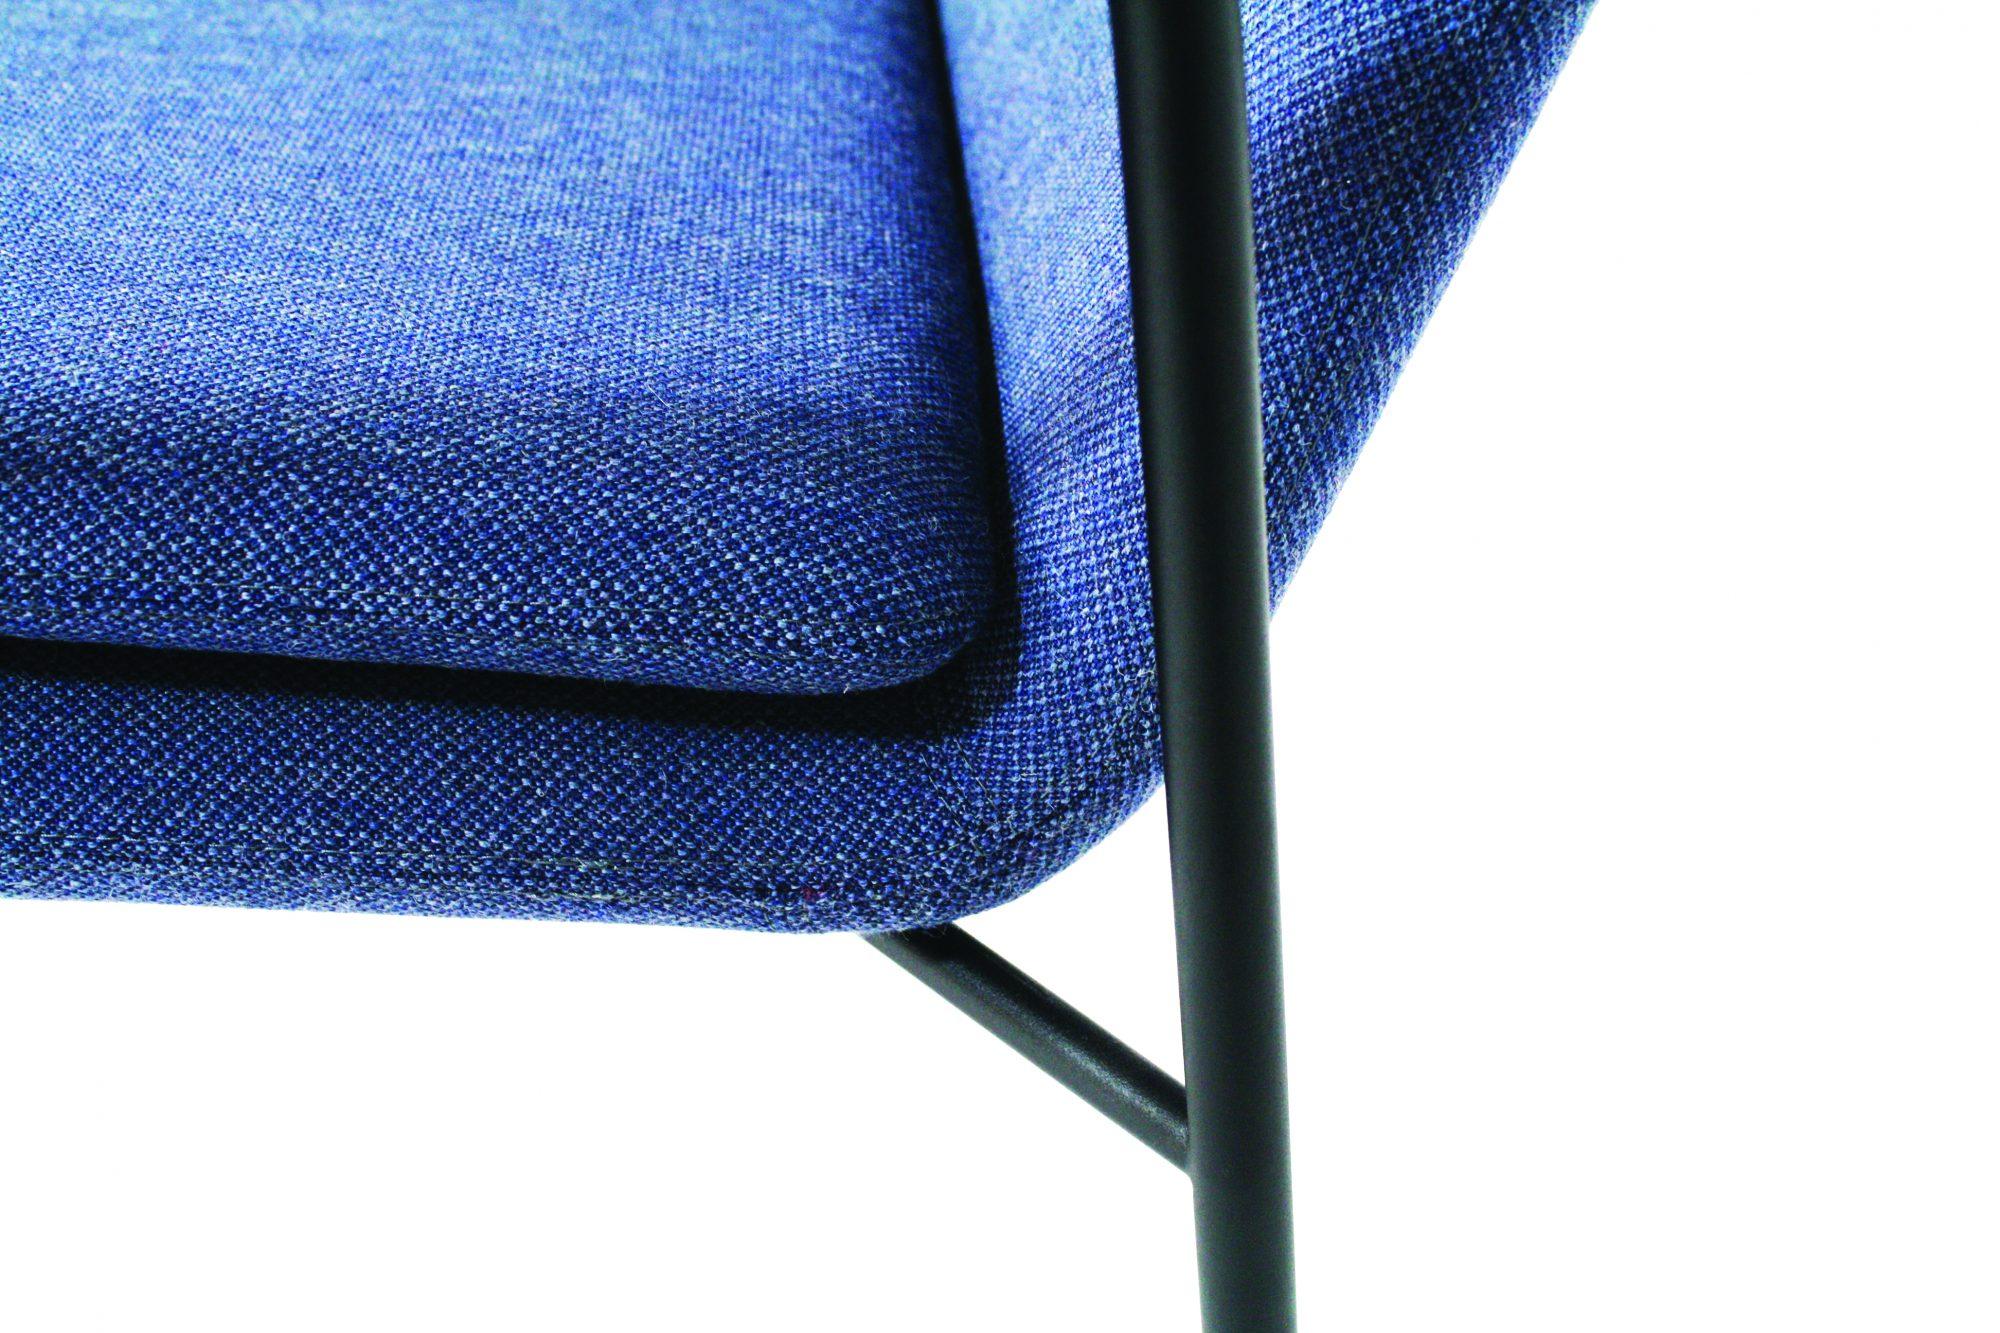 HOYO lounge chair by Lars Vejen for JENSENplus